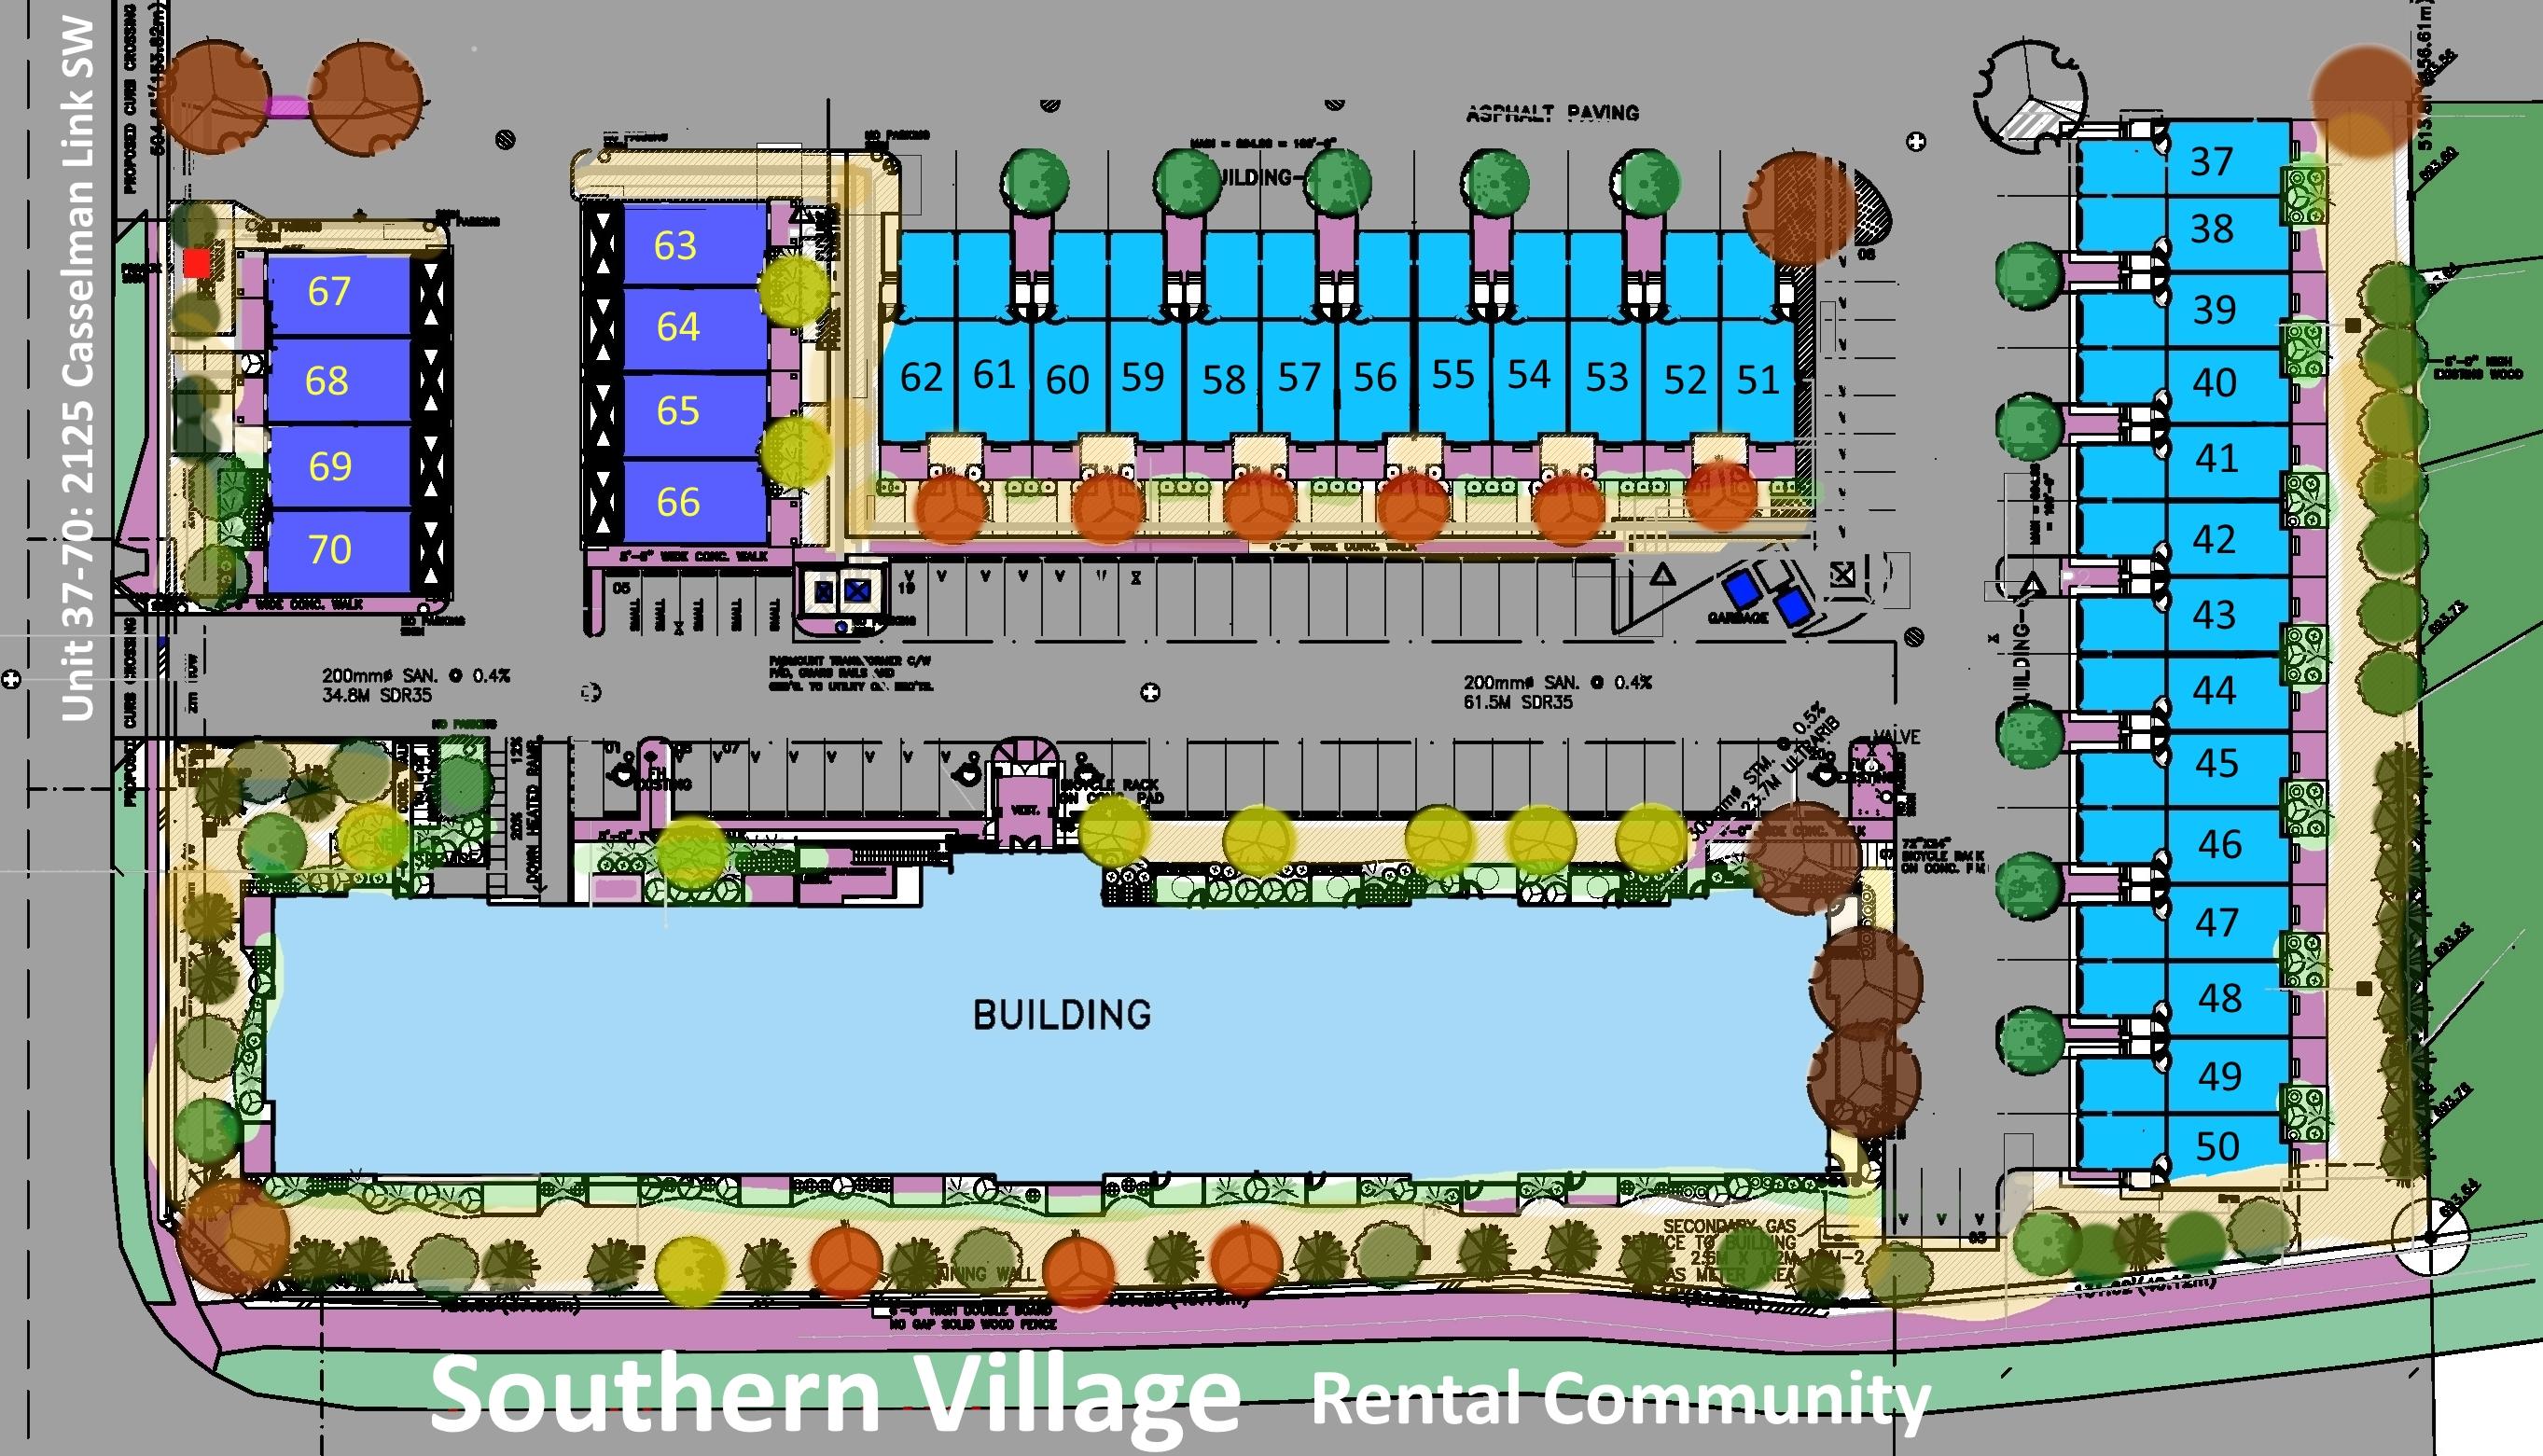 Southern Village Rental Community